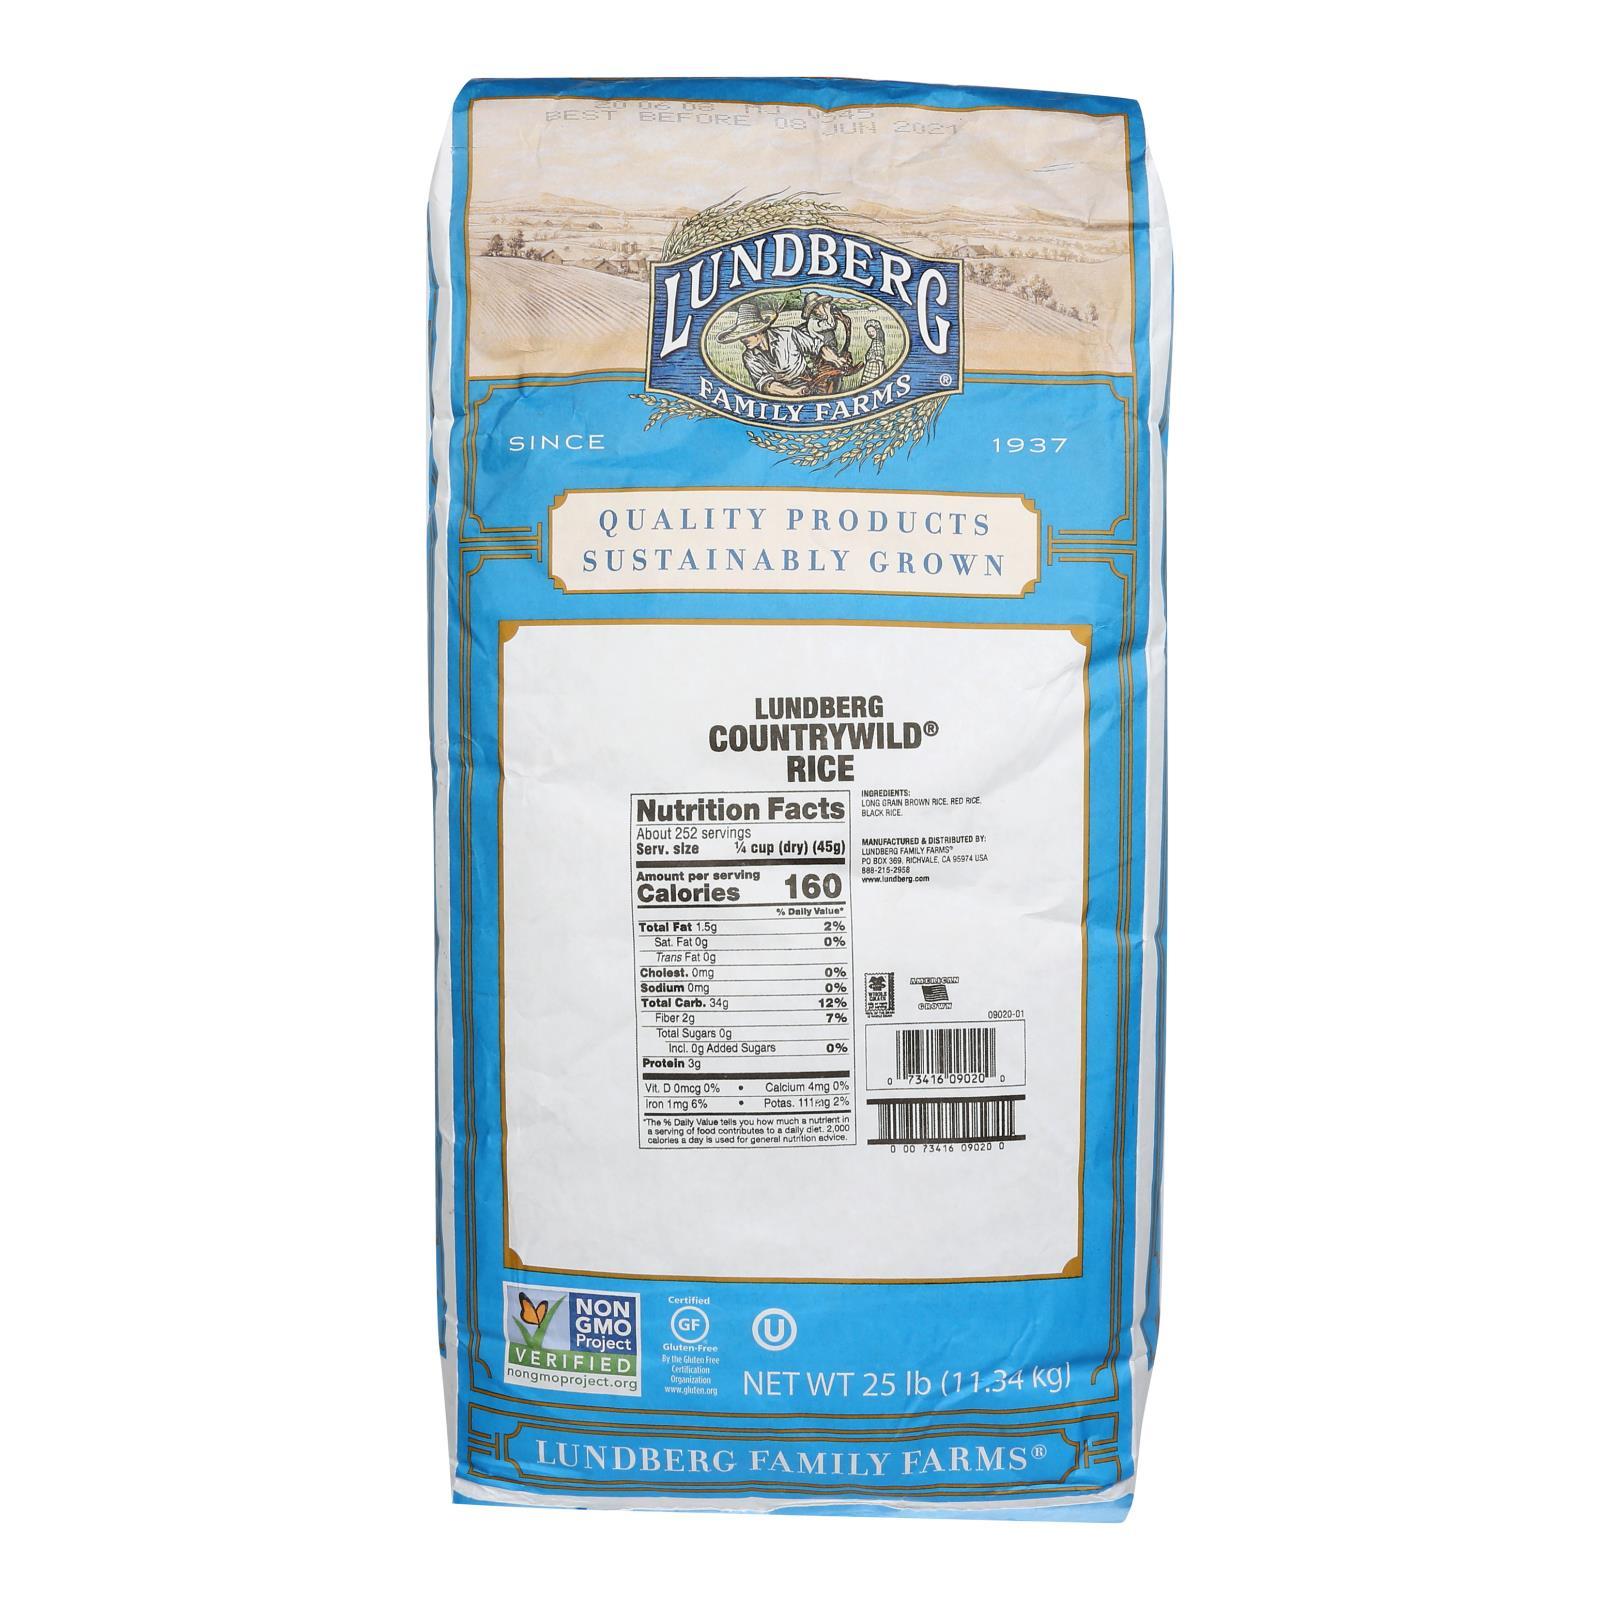 Lundberg Family Farms Whole Grain Brown Rice - Case of 25 lbs